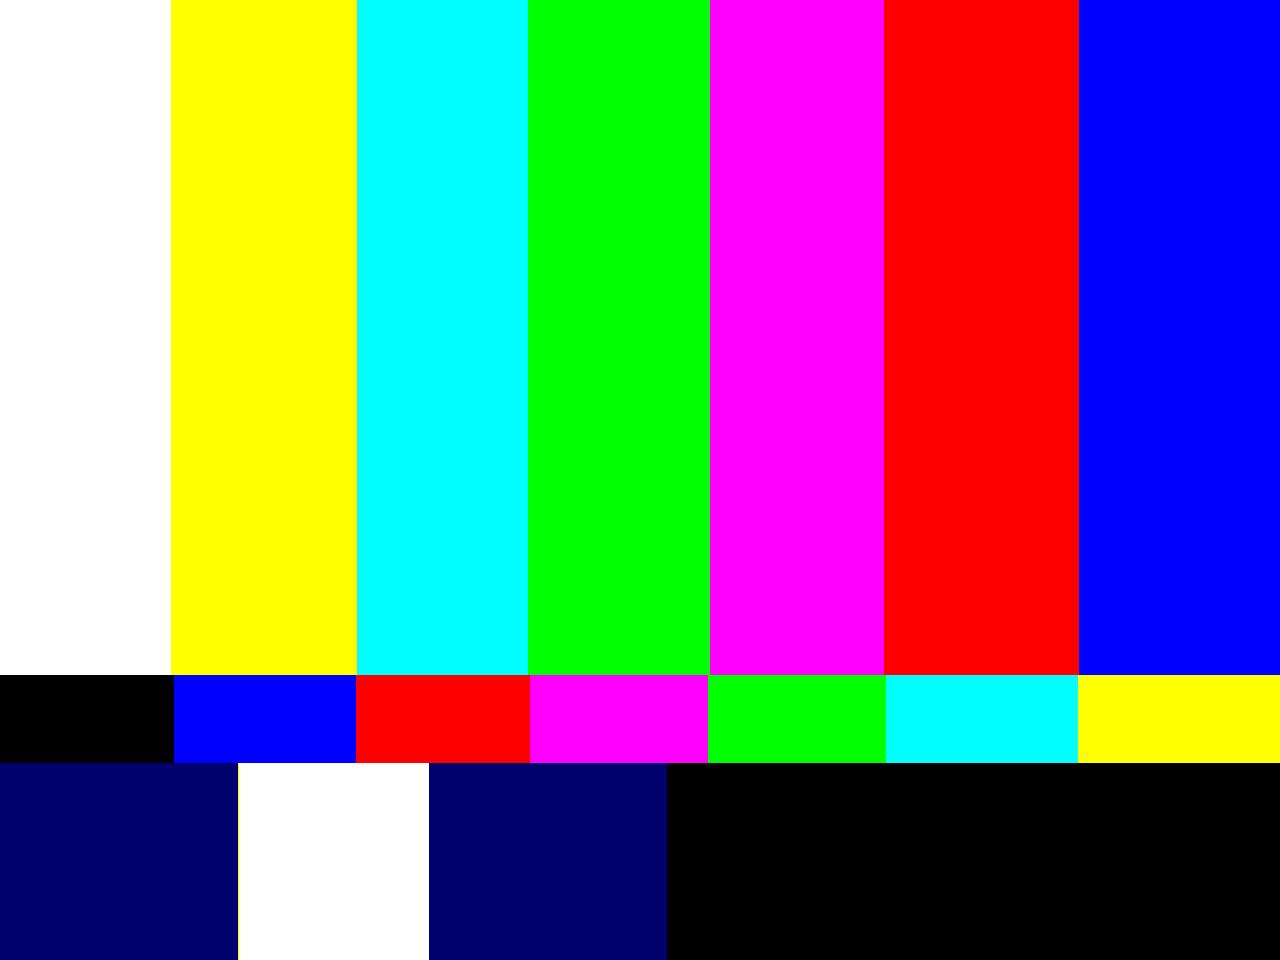 video color test patternjpg